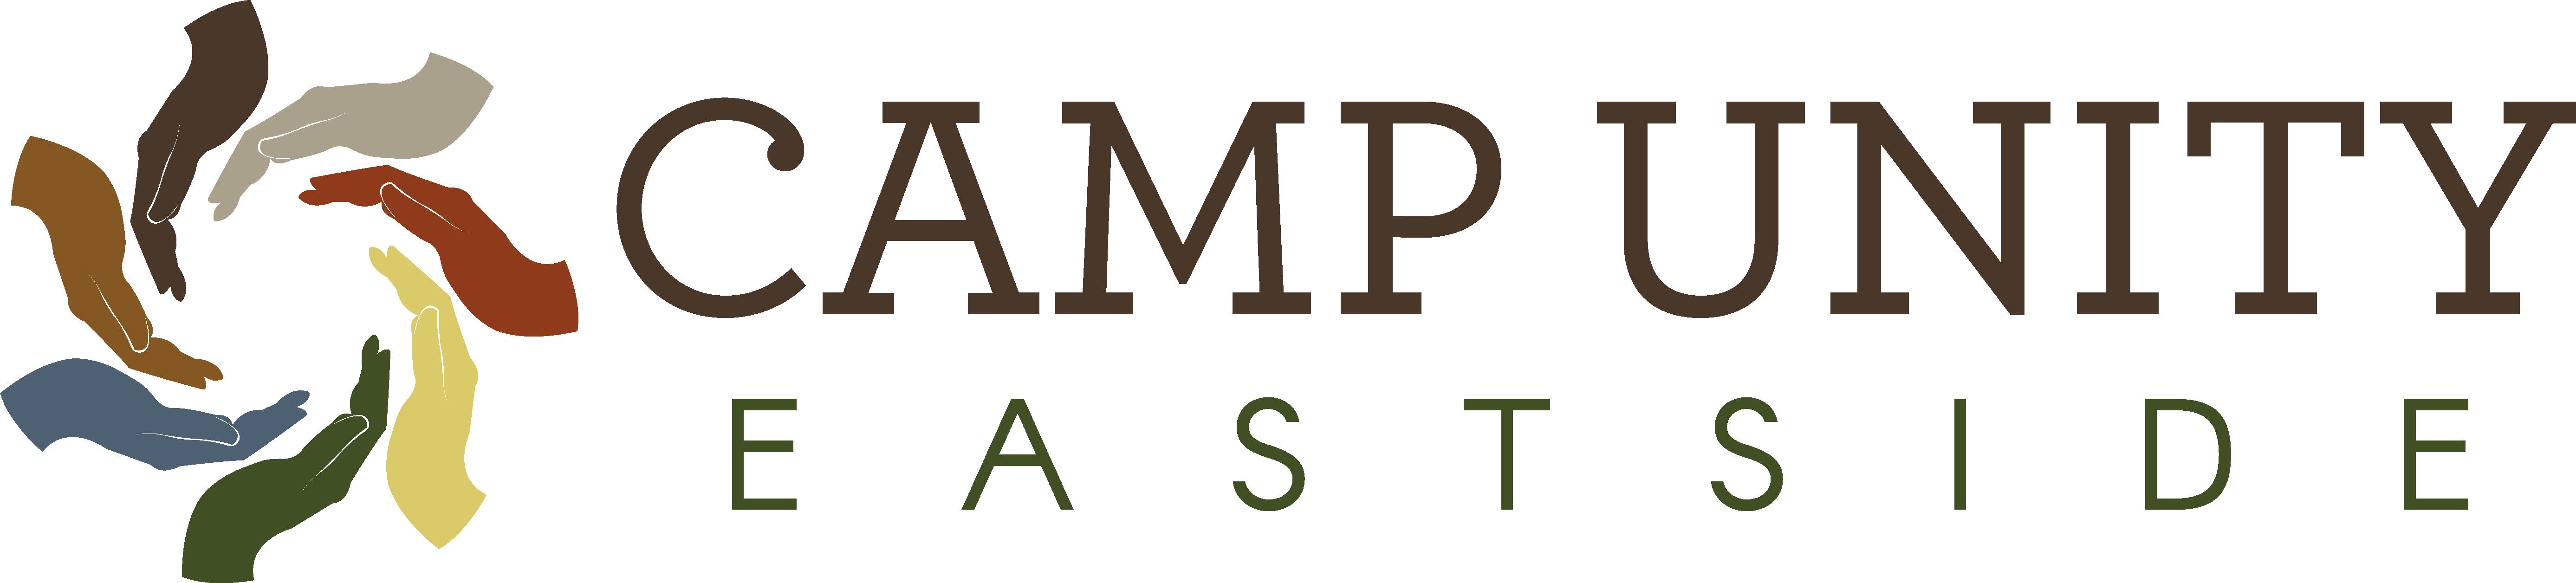 Camp Unity Eastside